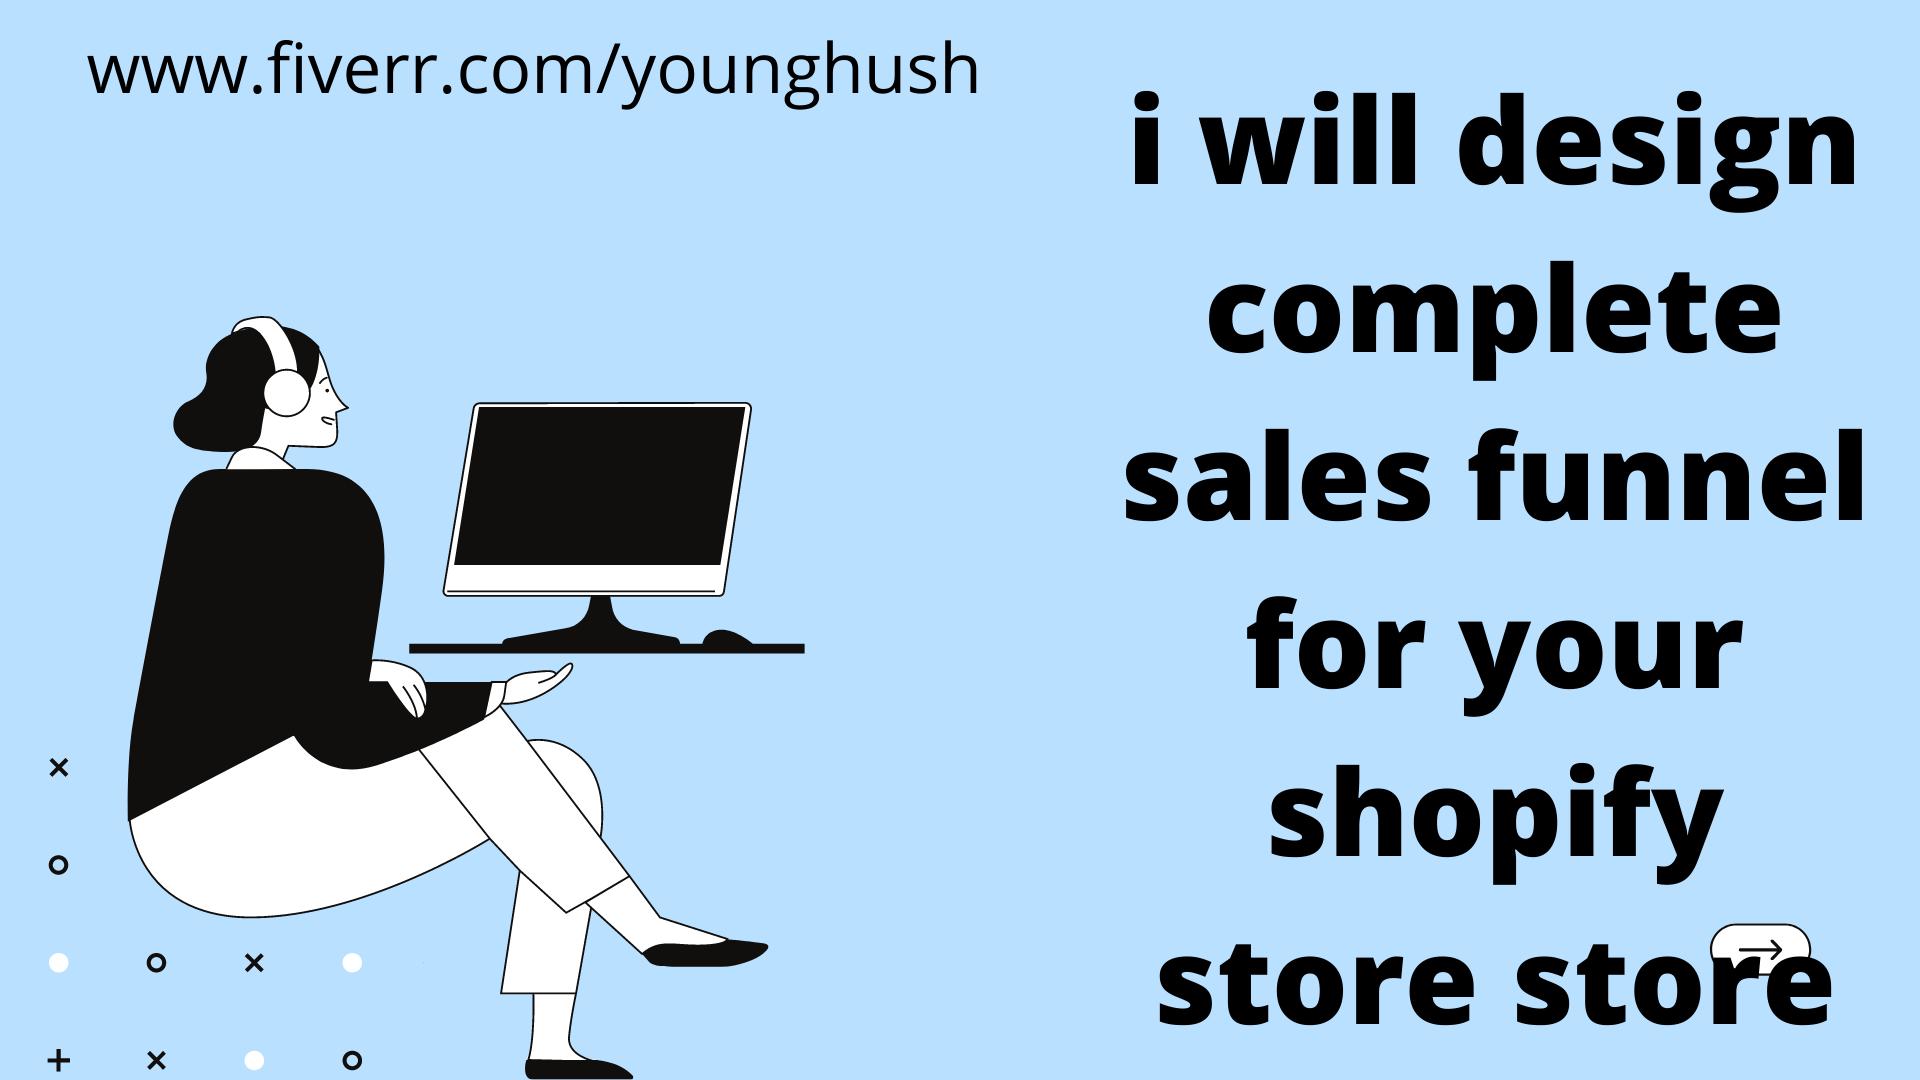 I will design sales funnel, shopify, click funnel, klaviyo, getresponse sales funnel, FiverrBox